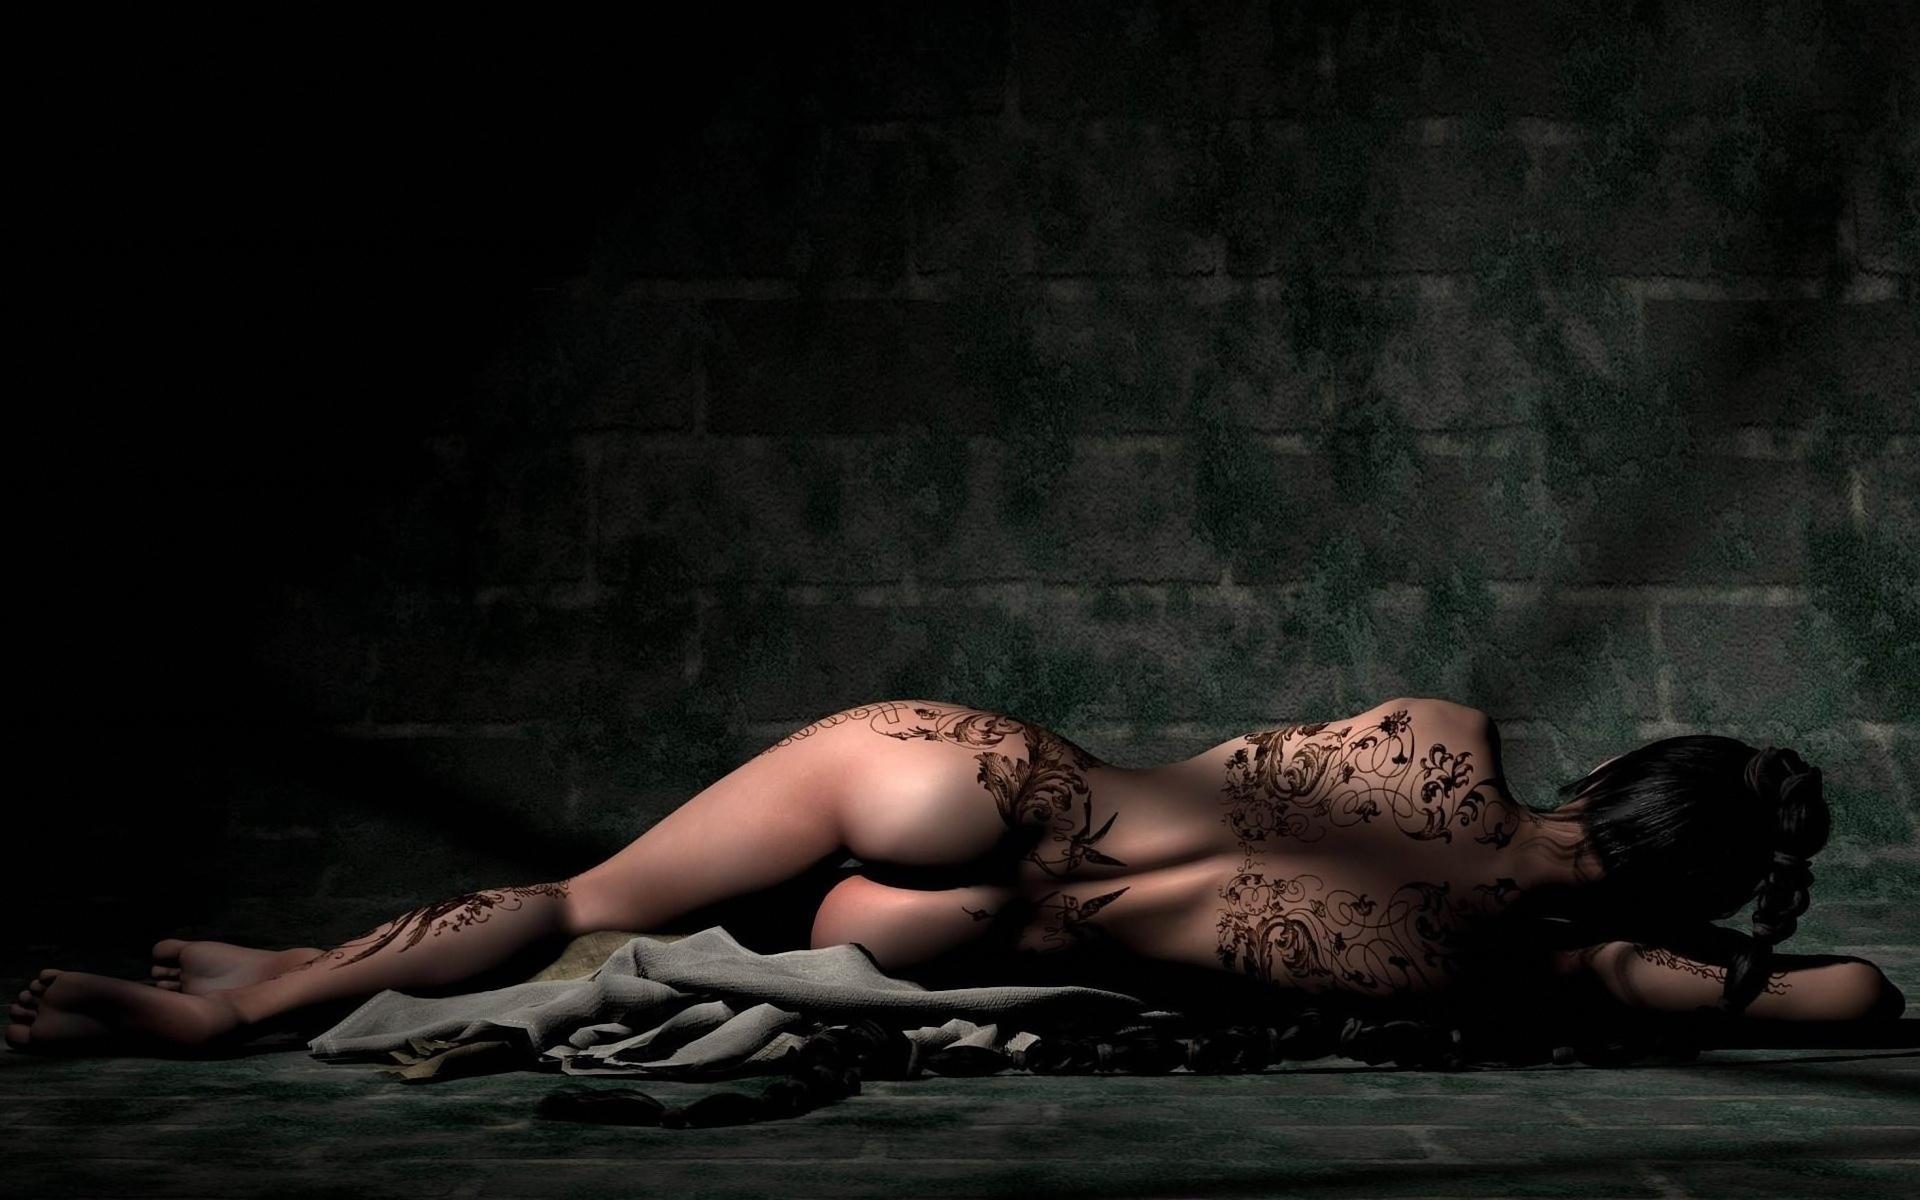 blonde-pulpeuse-nude-psp-wallpaper-having